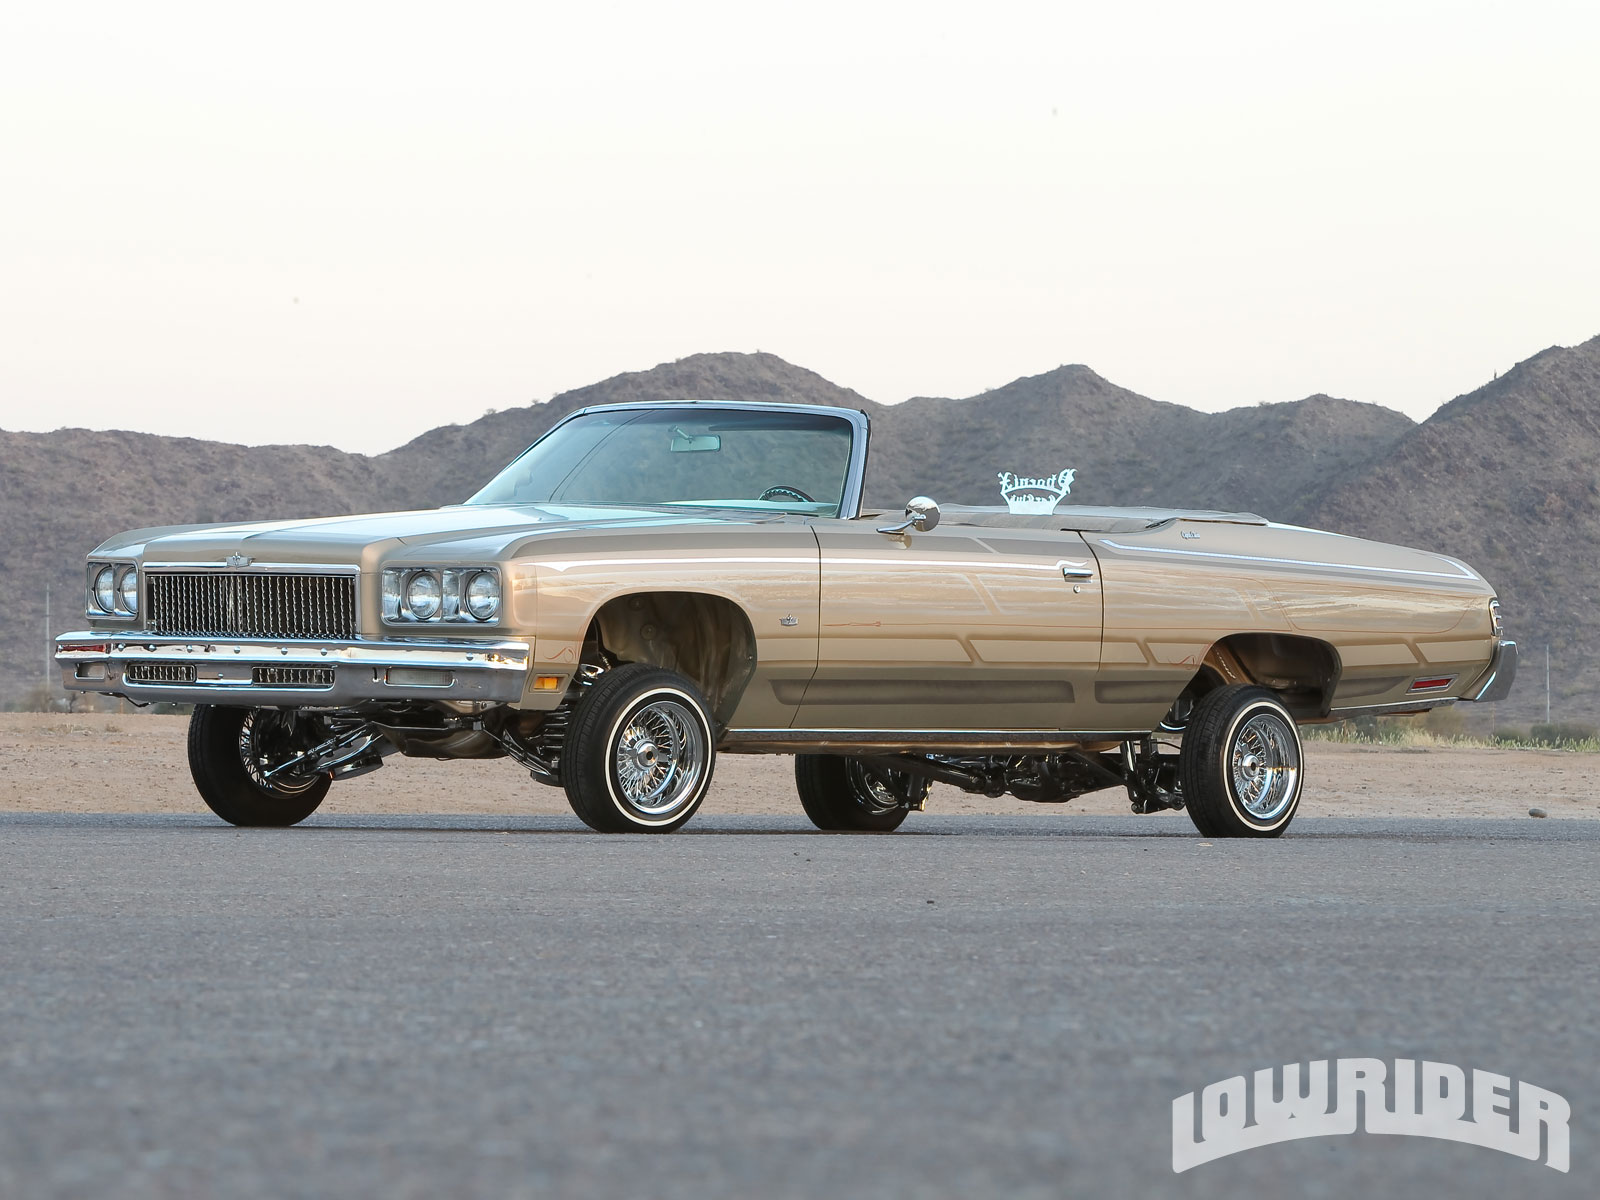 1975 Chevrolet Caprice Convertible - Lowrider Magazine